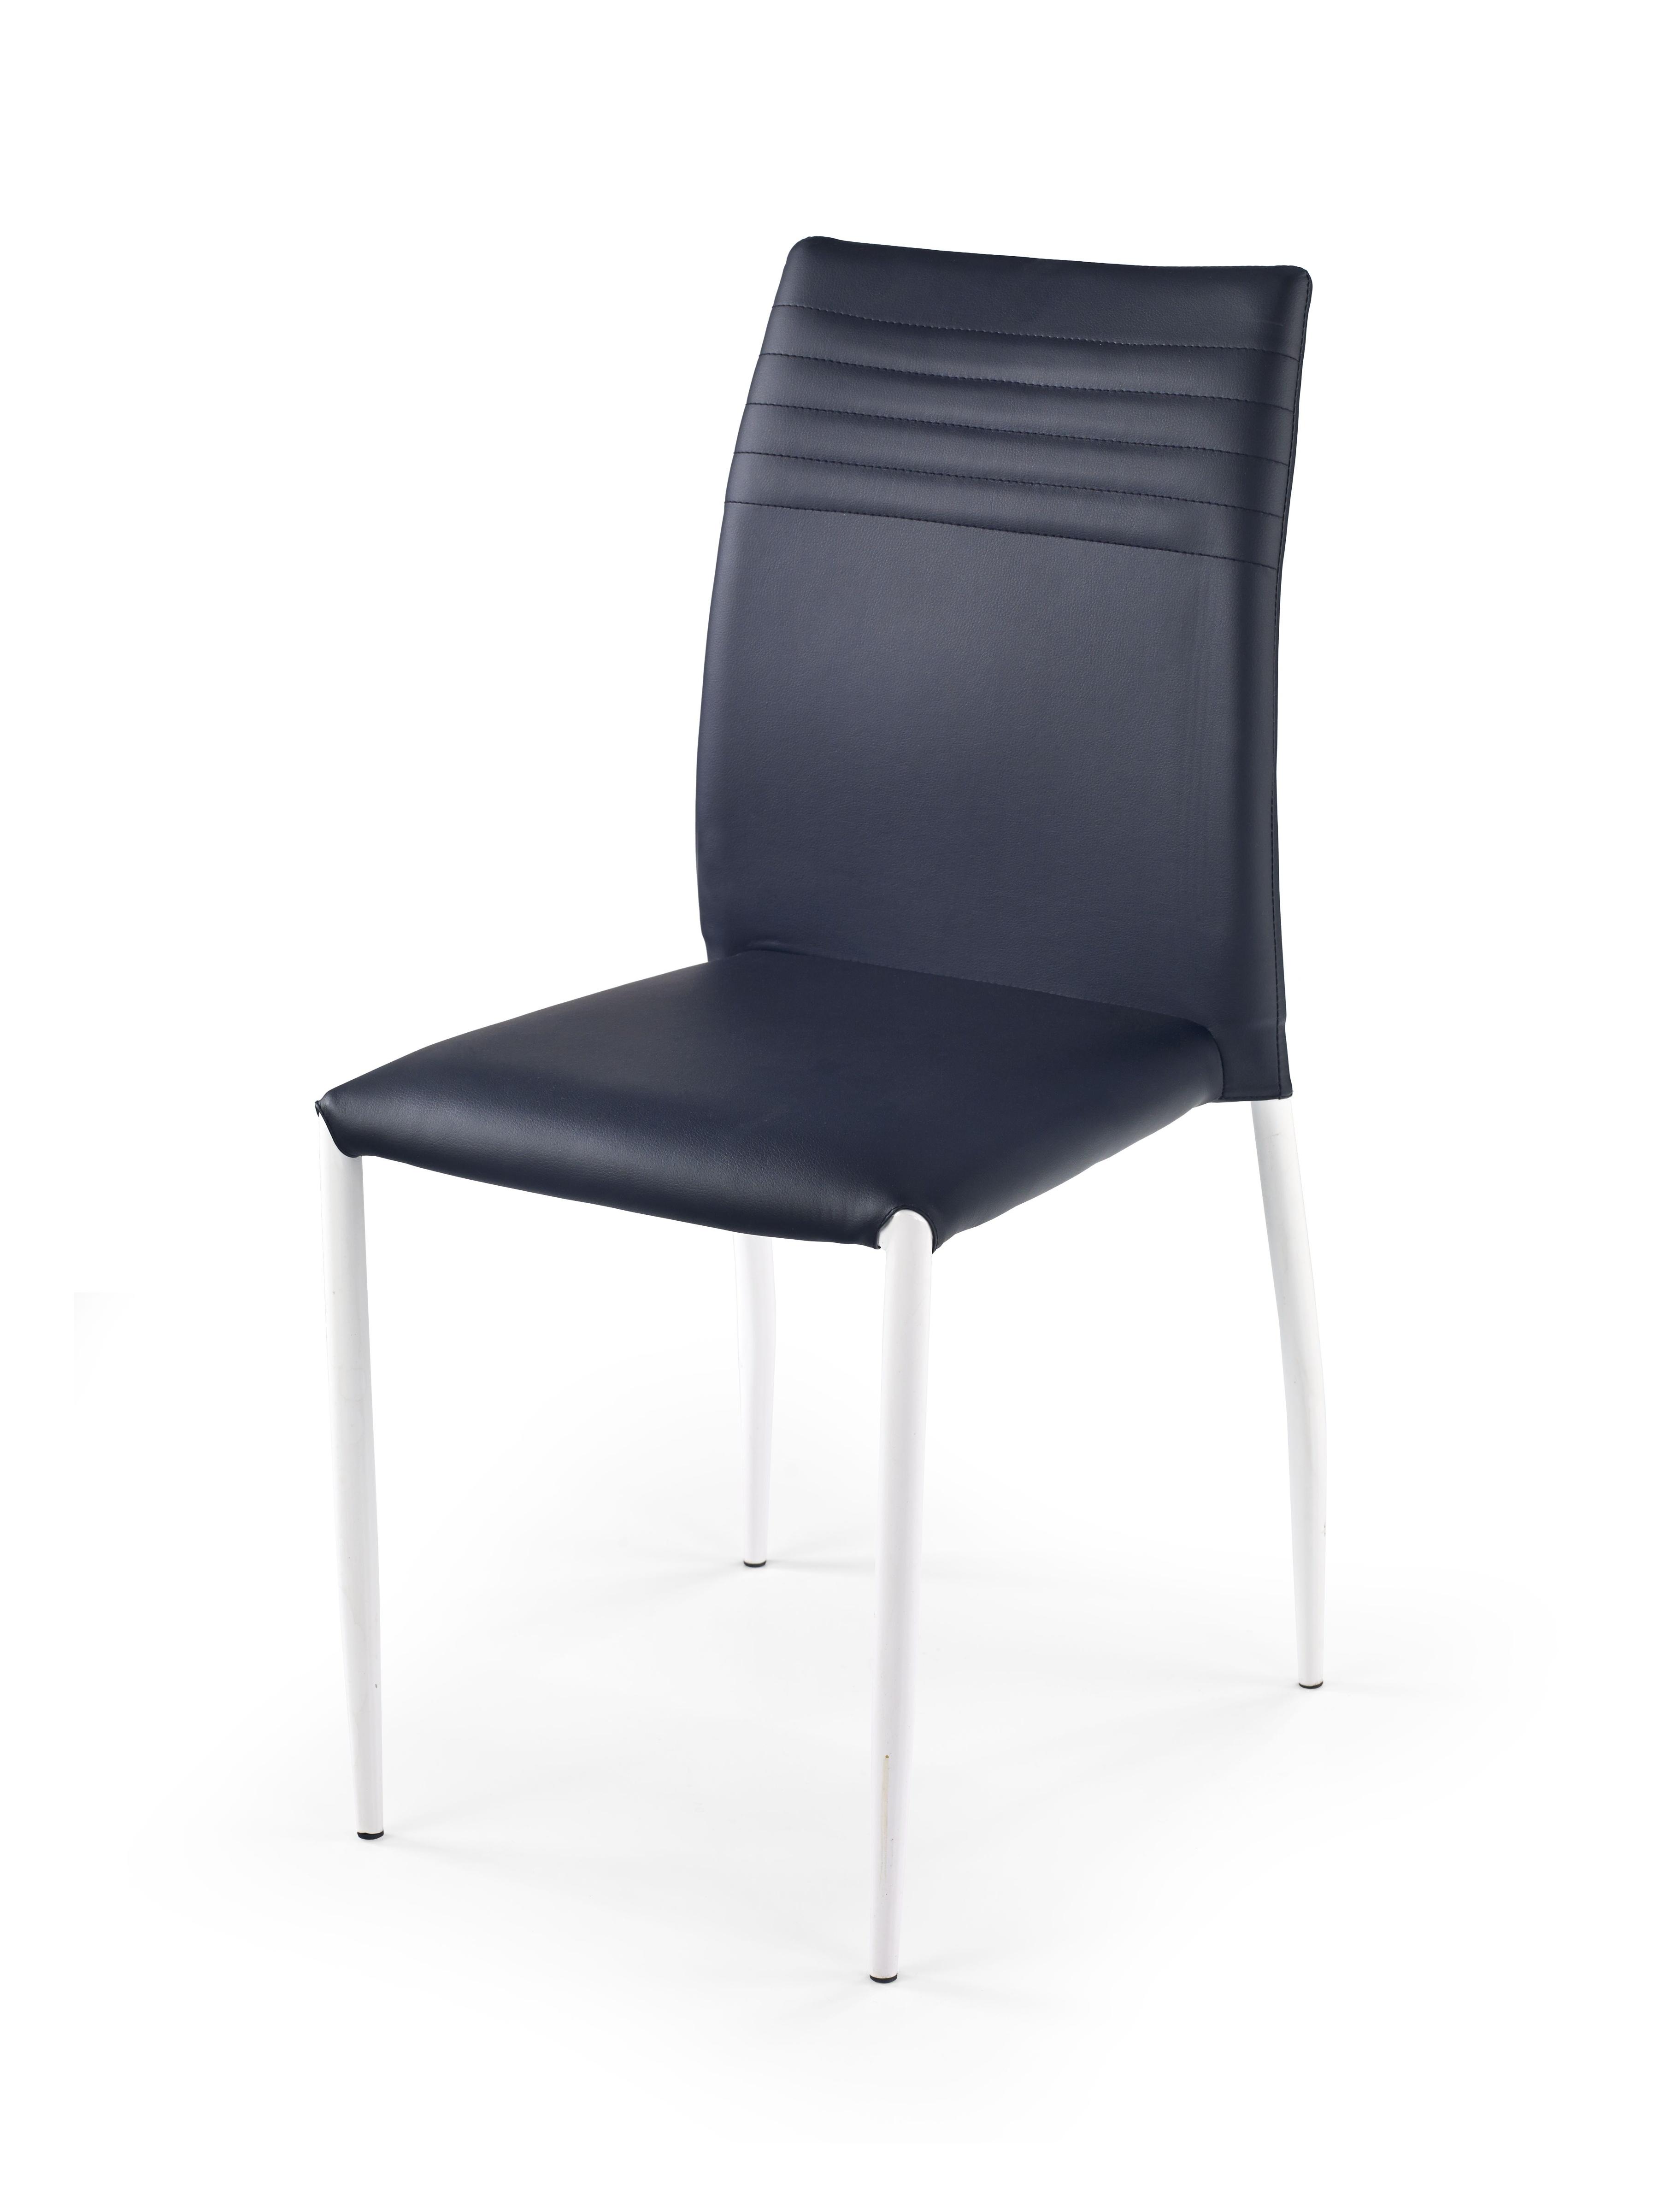 Jedálenská stolička - Halmar - K 168 biela + čierna